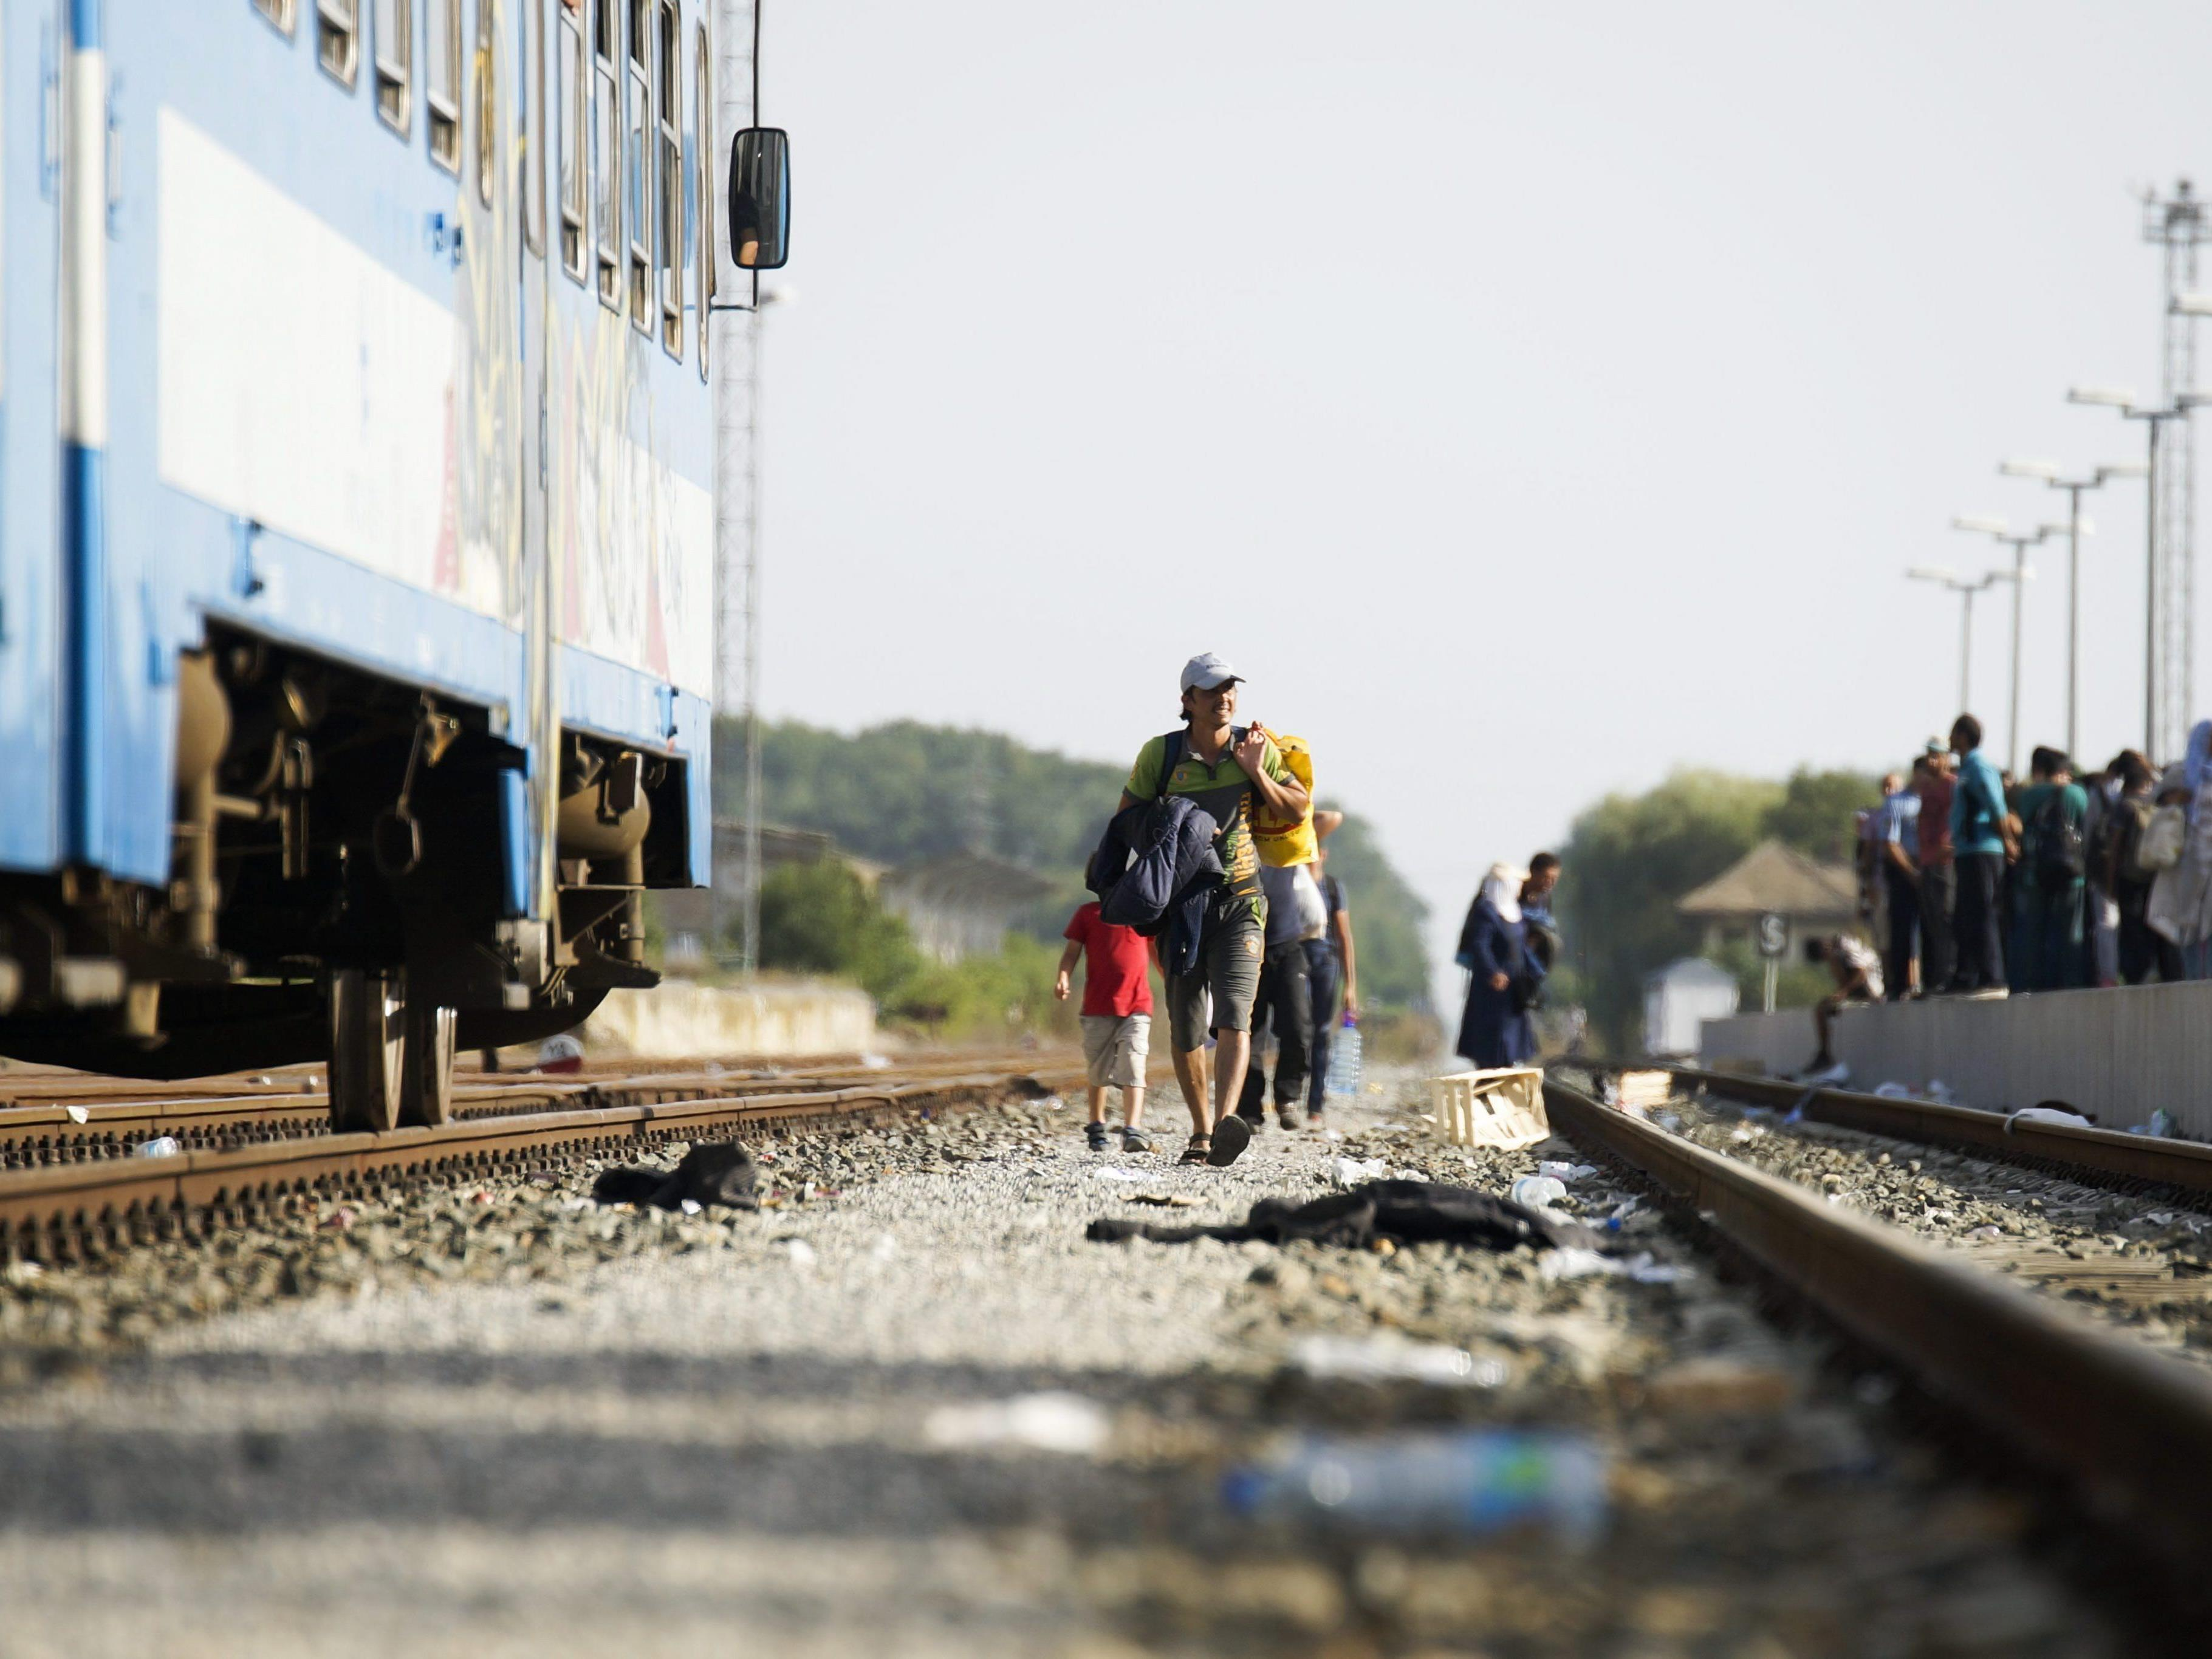 Spannungen wegen der aktuellen Flüchtlingskrise in ganz Europa